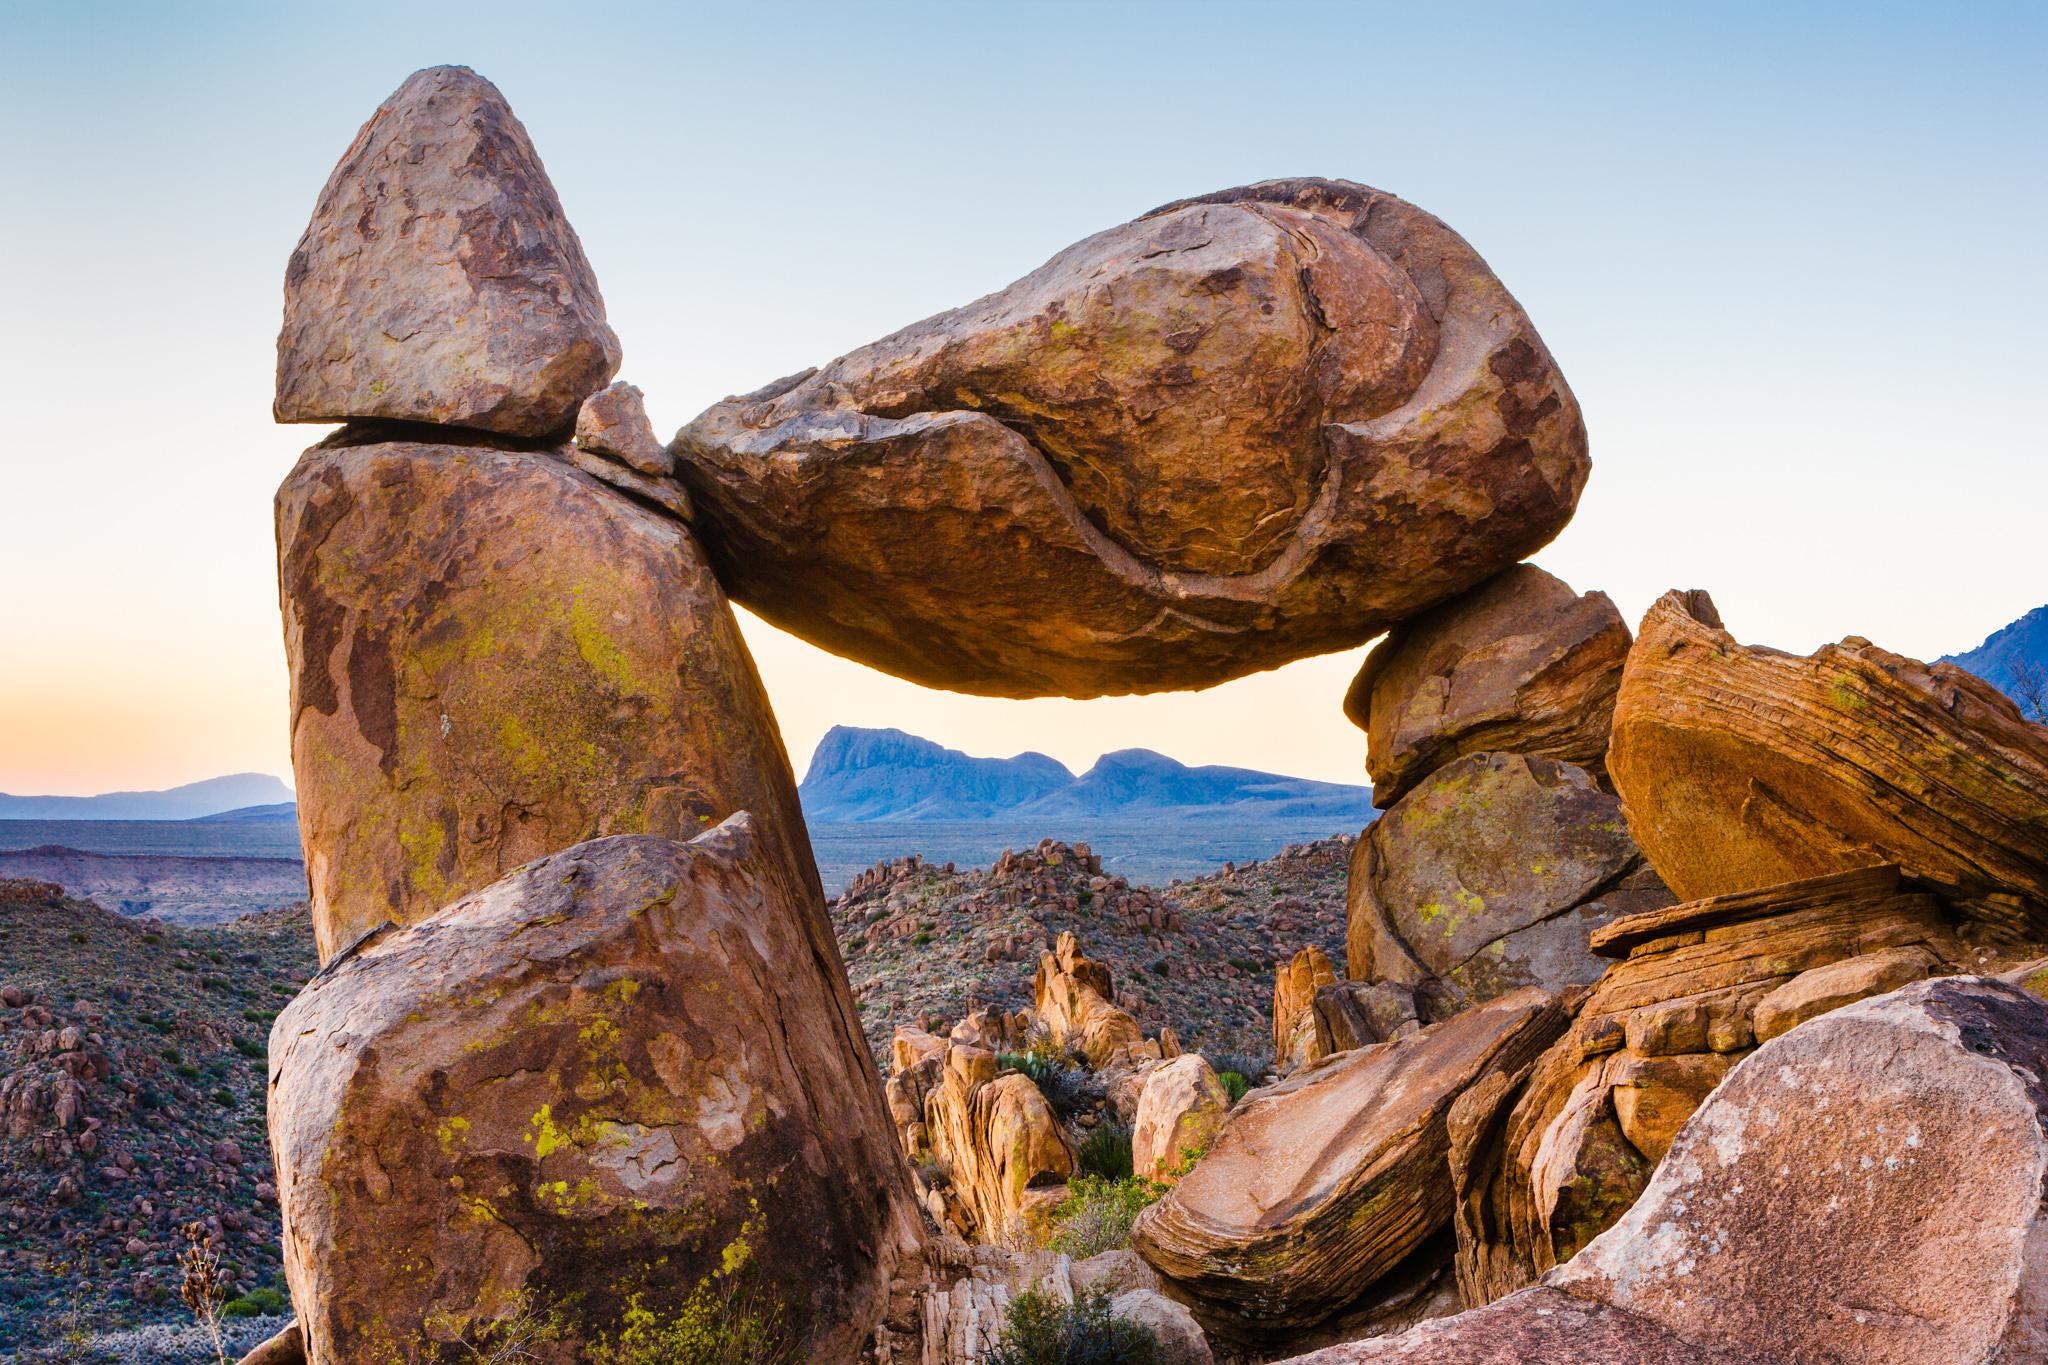 Balanced Rock in Big Bend